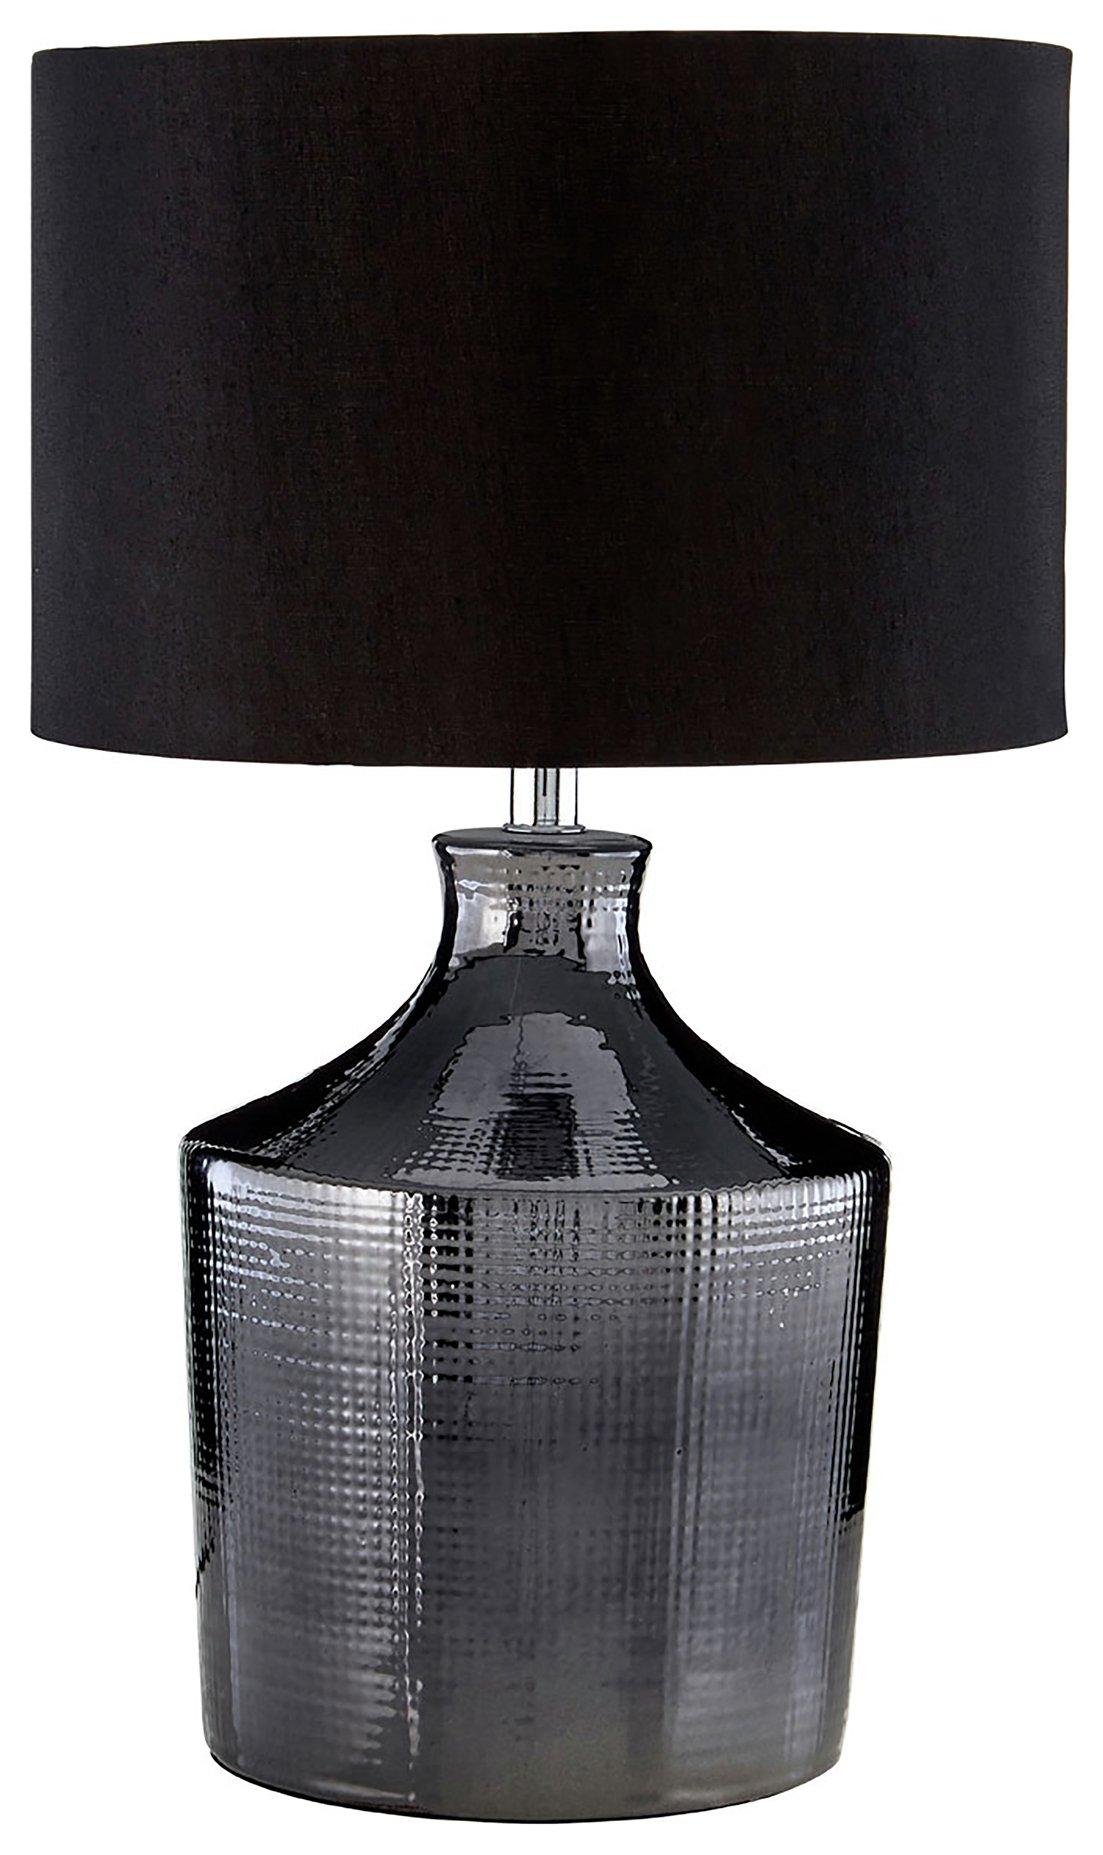 Image of Jeff - Ceramic - Table Lamp - Black & Chrome